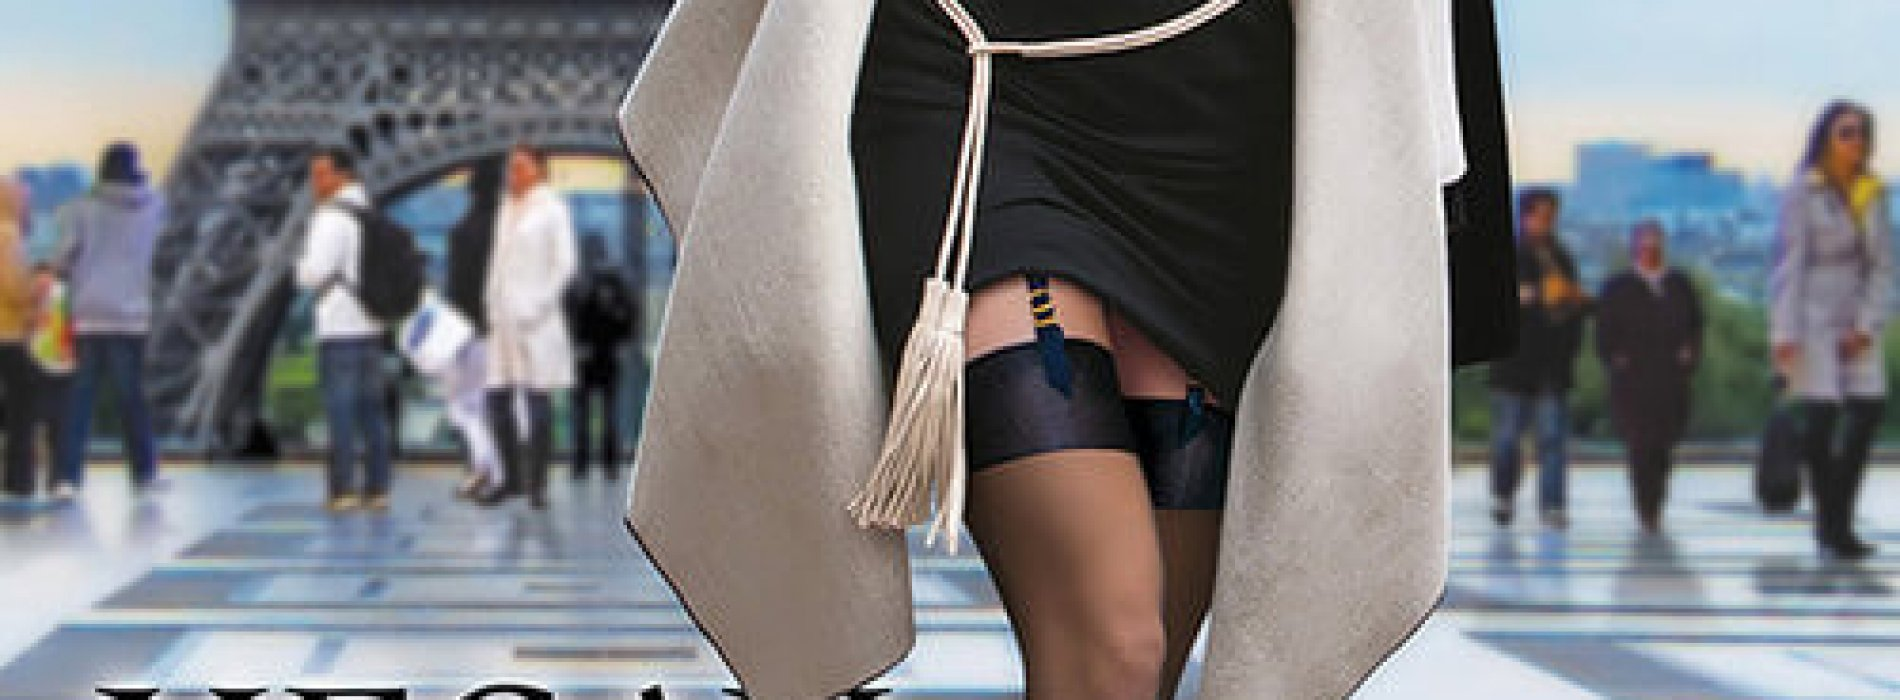 sit porno escort girl luxe